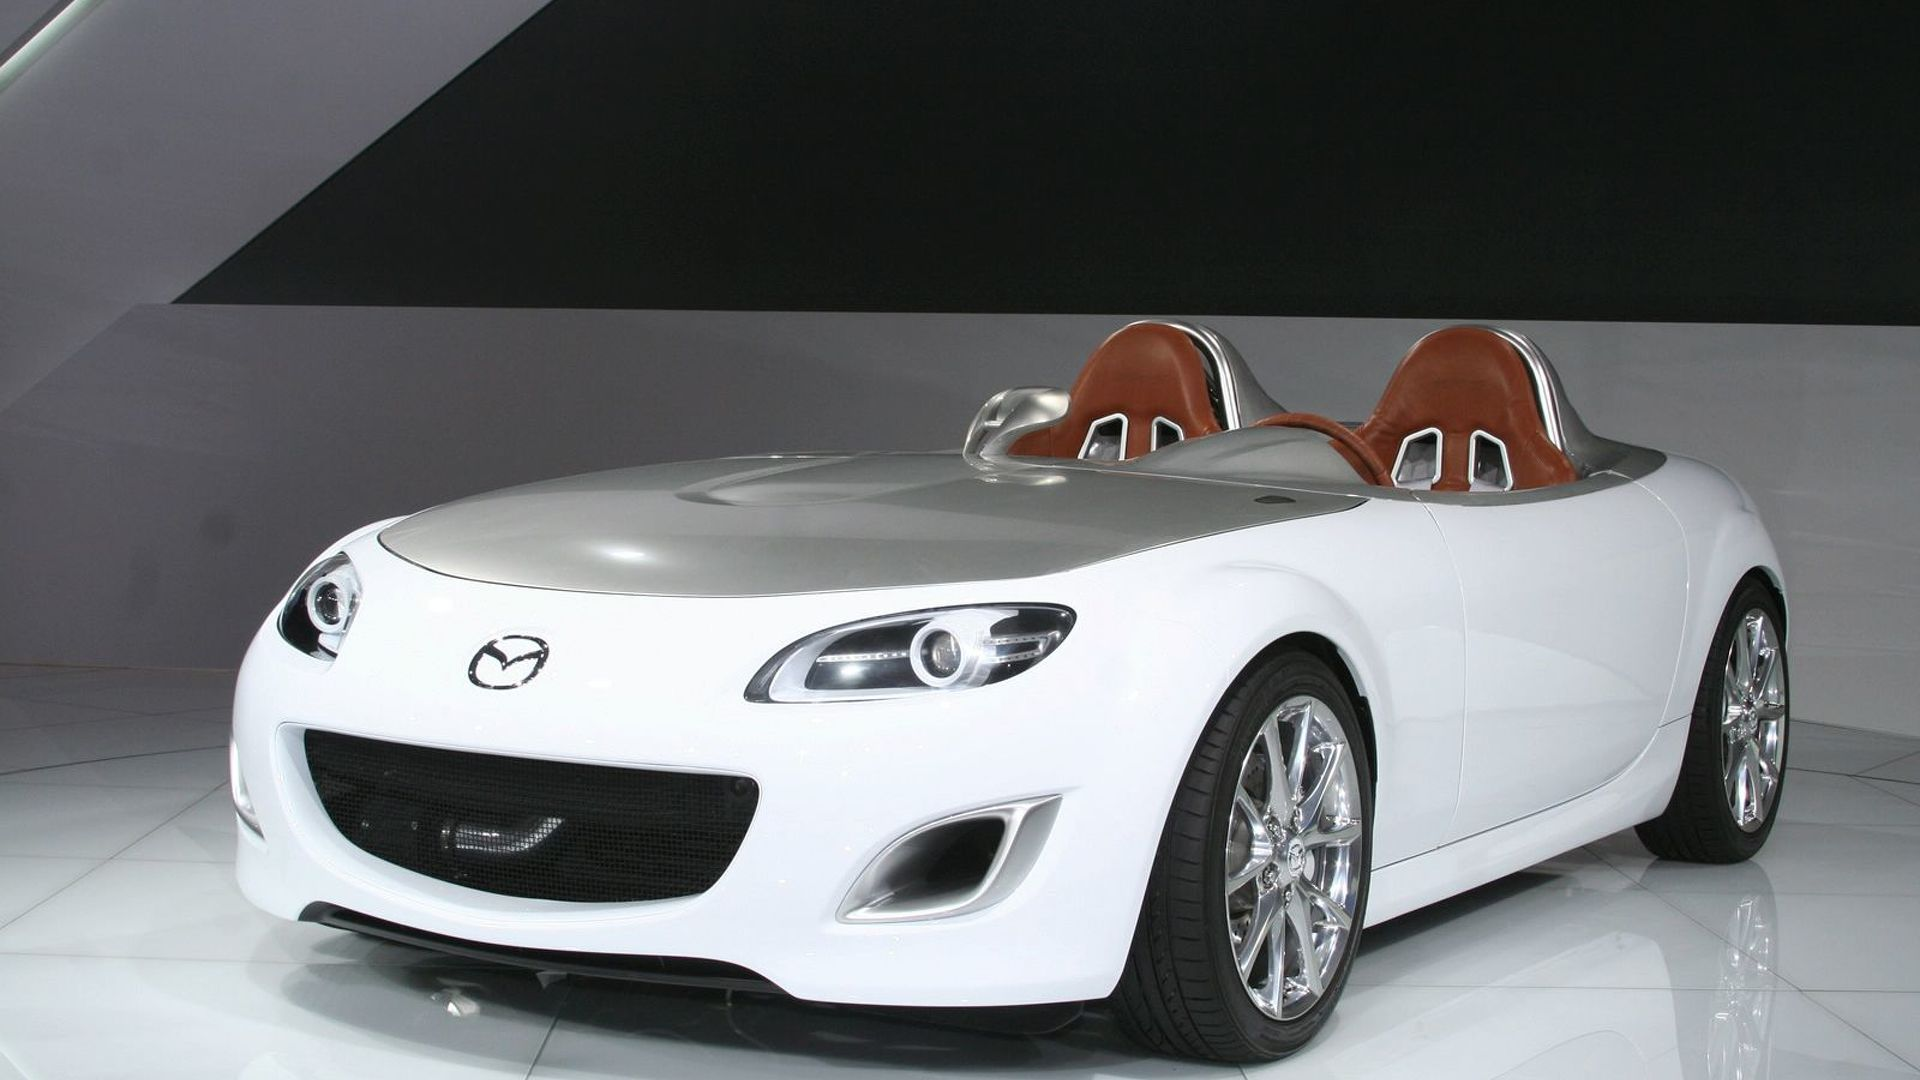 https://icdn-0.motor1.com/images/mgl/AKPMV/s1/2009-182386-mazda-mx-5-superlight-concept-at-2009-frankfurt-motor-show1.jpg